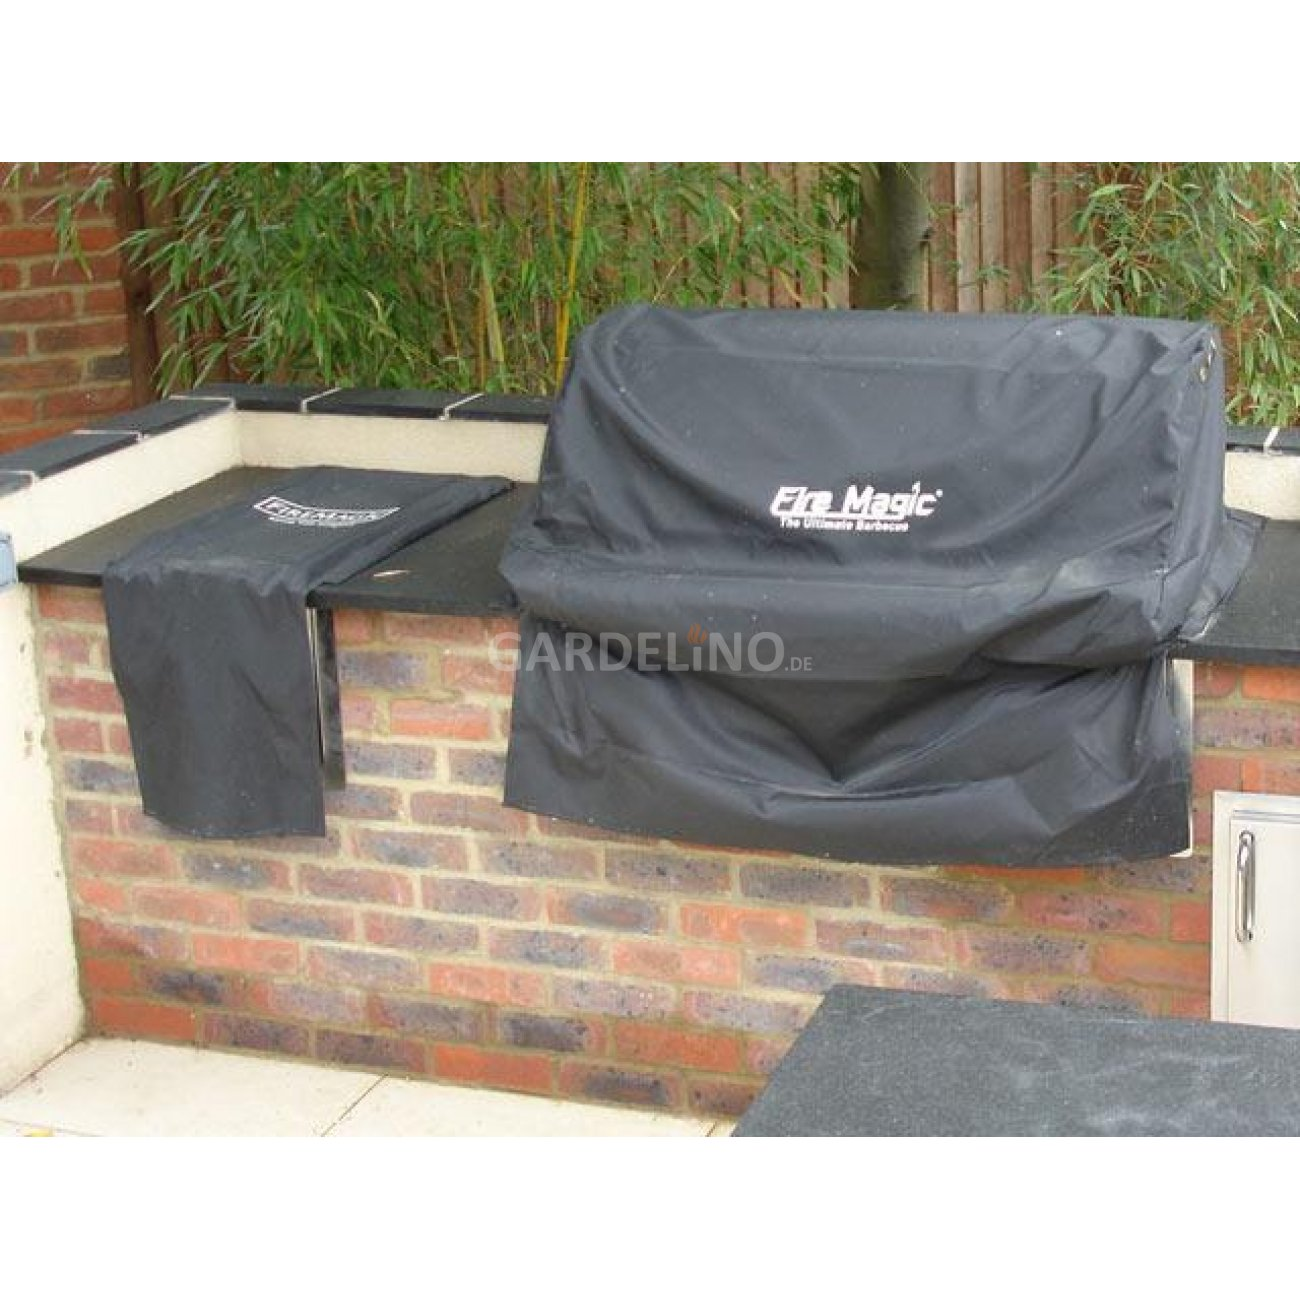 fire magic grill abdeckhaube. Black Bedroom Furniture Sets. Home Design Ideas